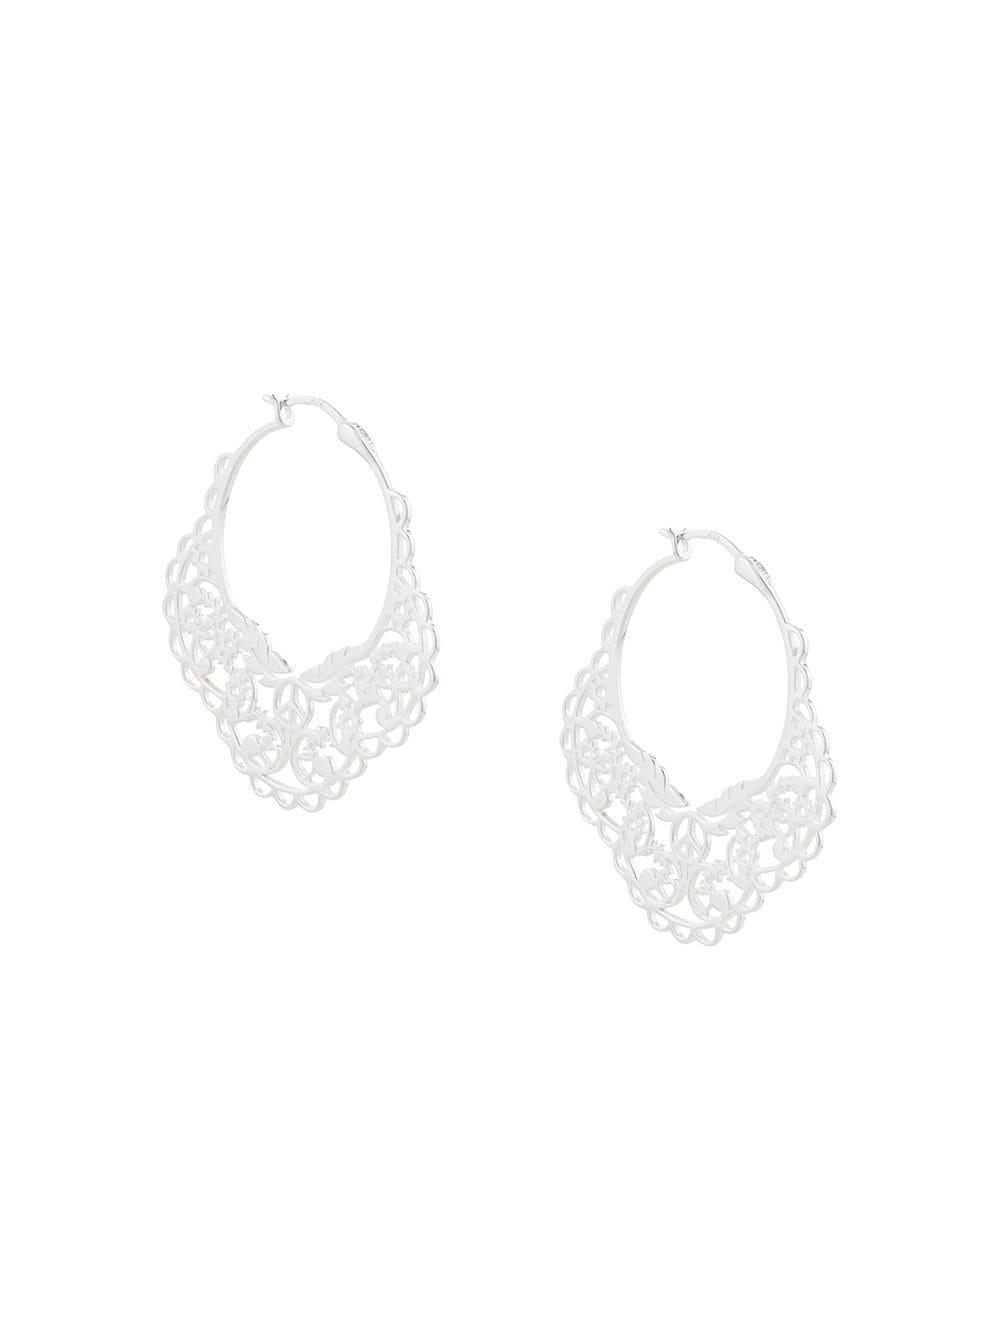 8dc1a419473 Karen Walker Filigree Earrings - Image Of Earring